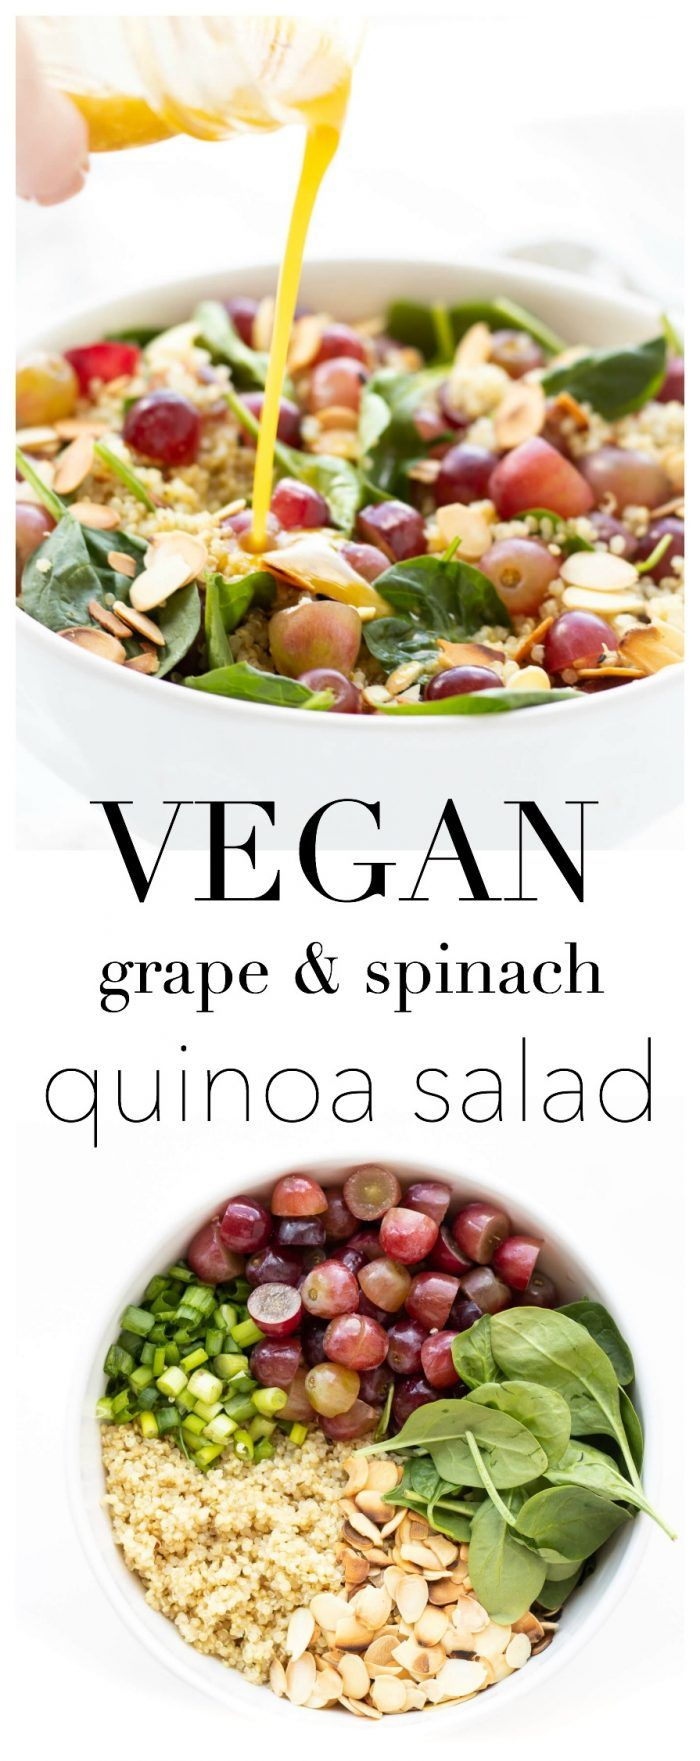 Toasted Almond, Grape & Spinach Quinoa Salad